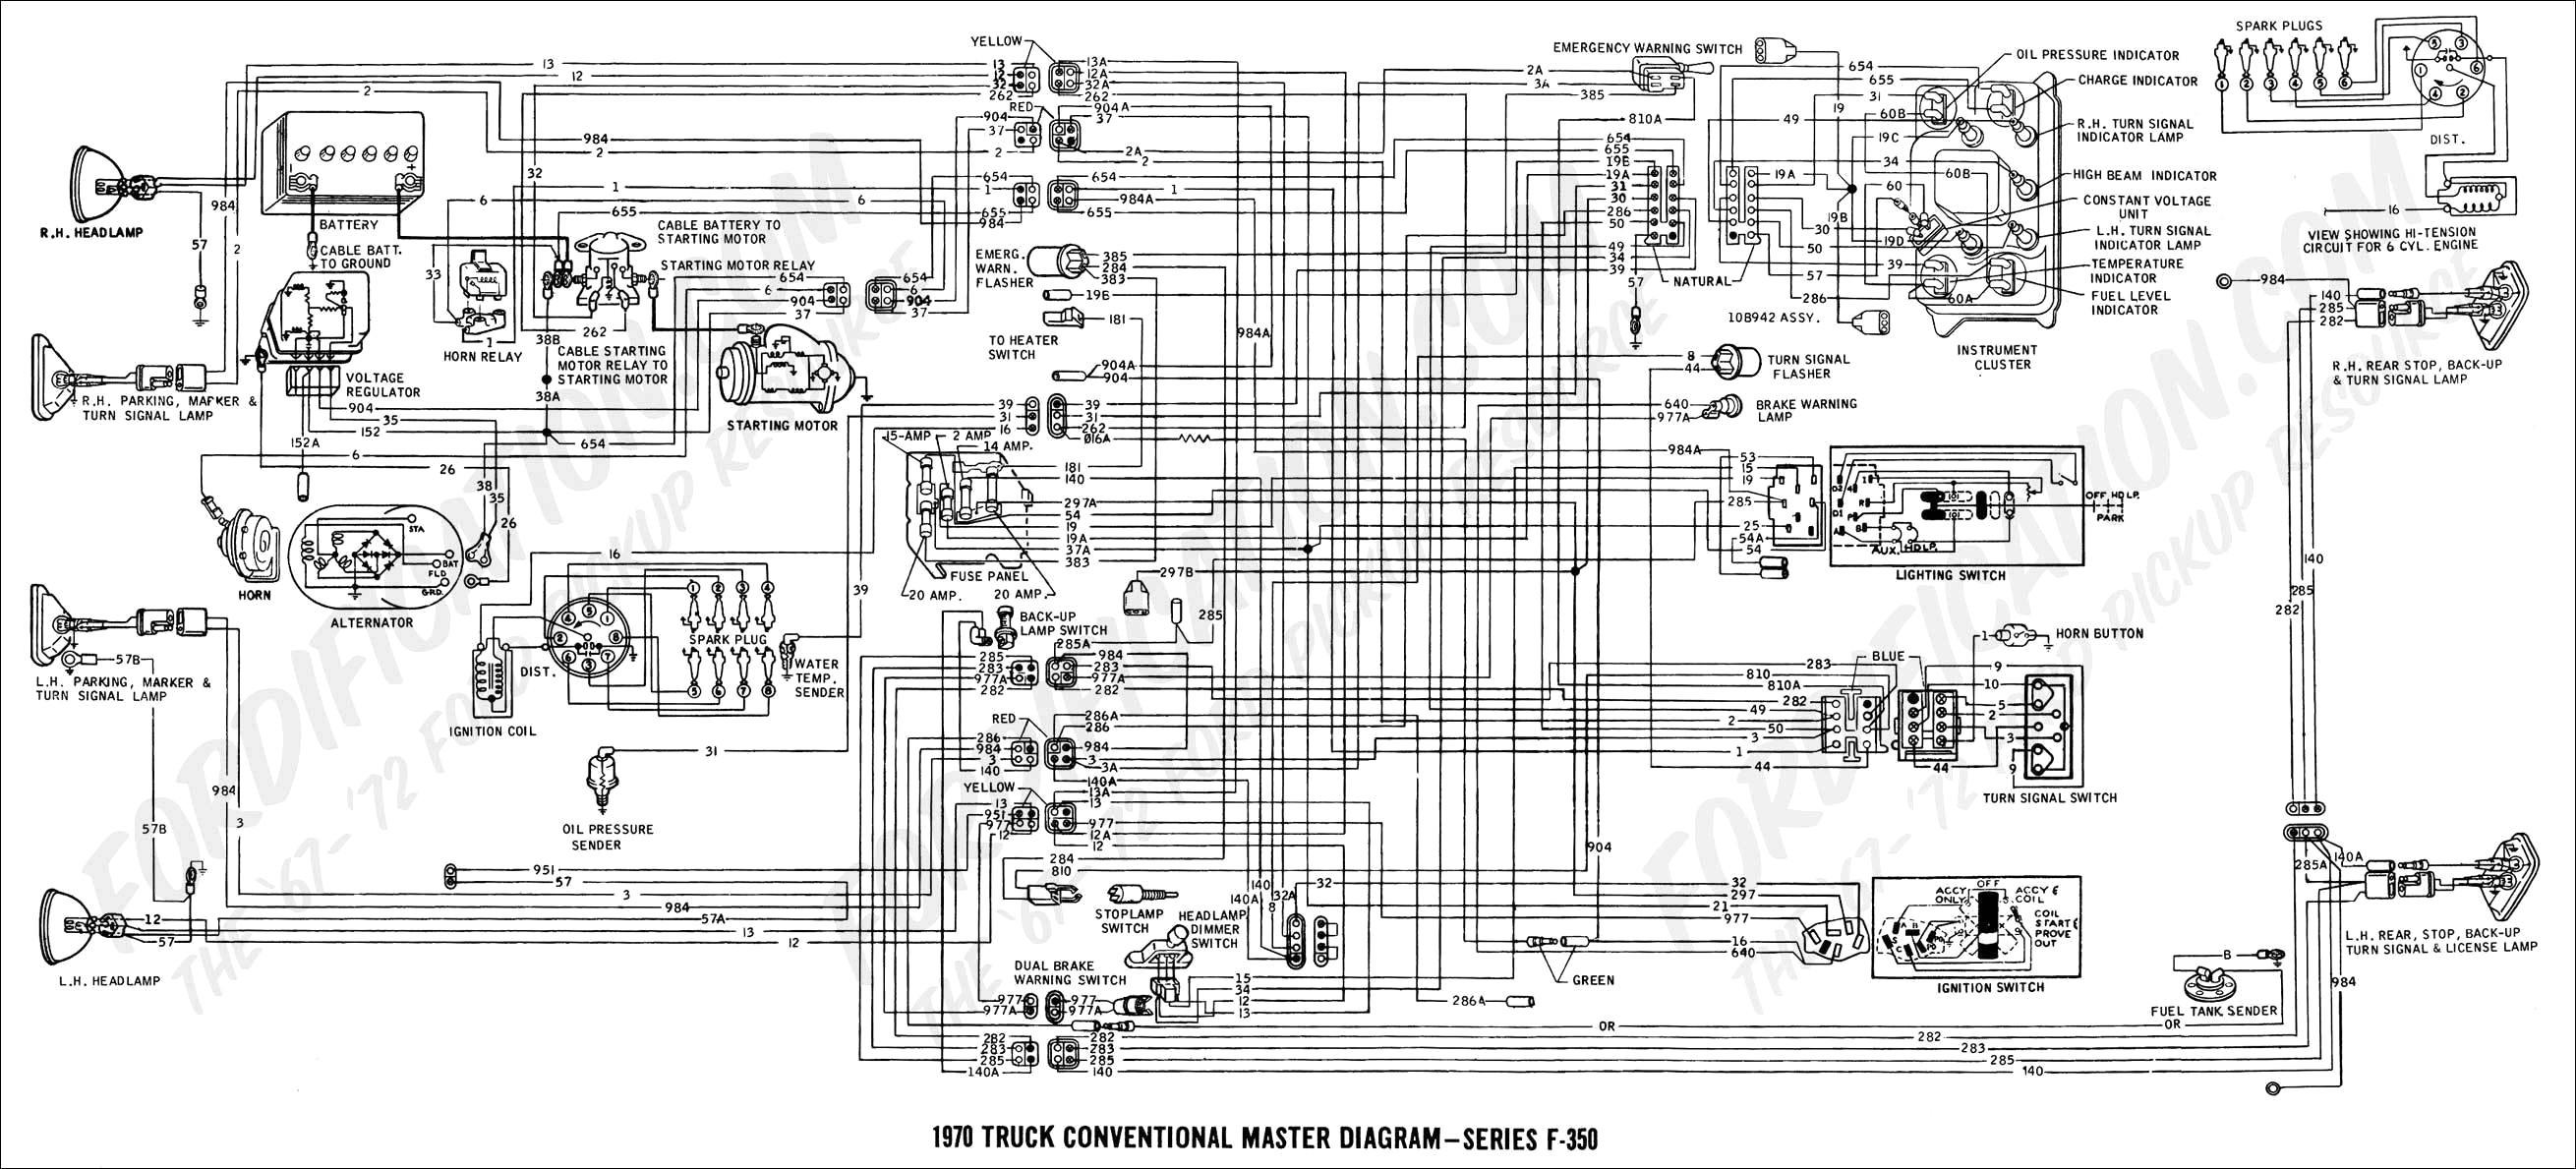 1995 Chevy Truck Parts Diagram 1967 C10 Wiring Diagram Truck Parts Chevrolet Truck Endearing Of 1995 Chevy Truck Parts Diagram